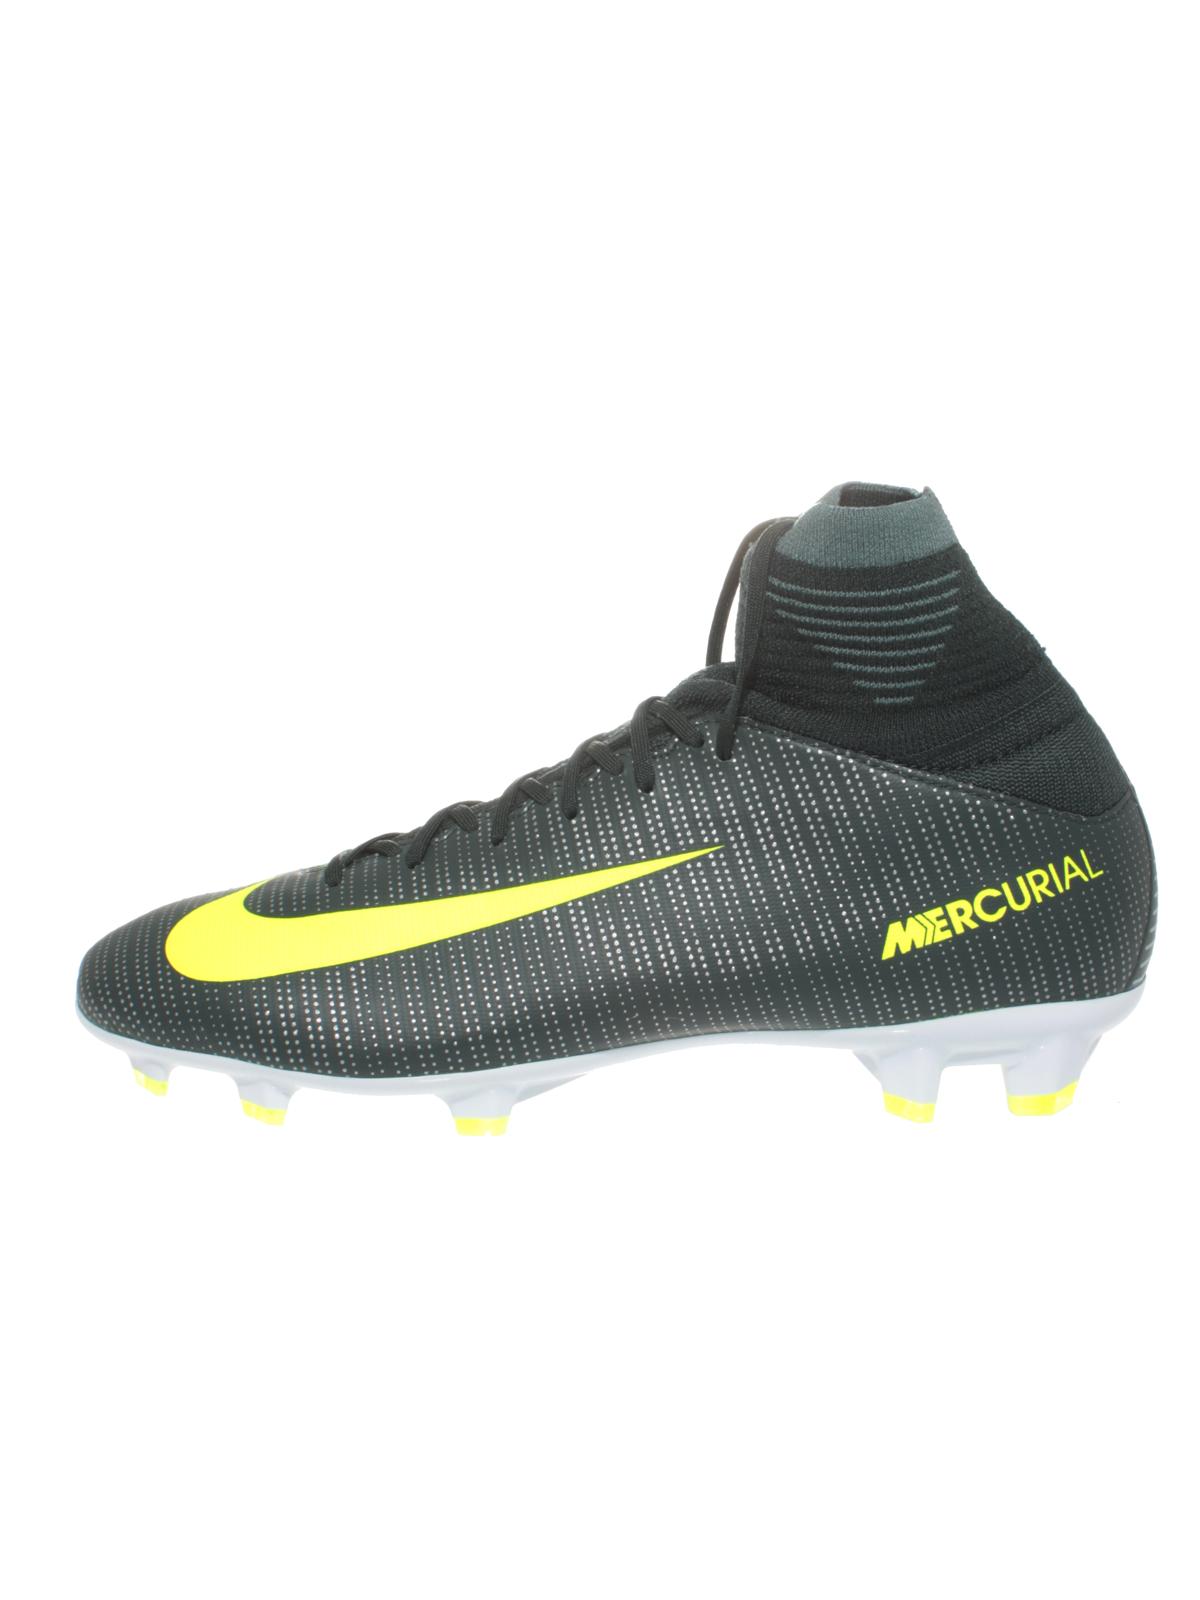 official photos dc395 bb909 Nike Kinder Fußballschuhe CR7 JR Mercurial Superfly V FG 852483  Socken-Schuh NEU